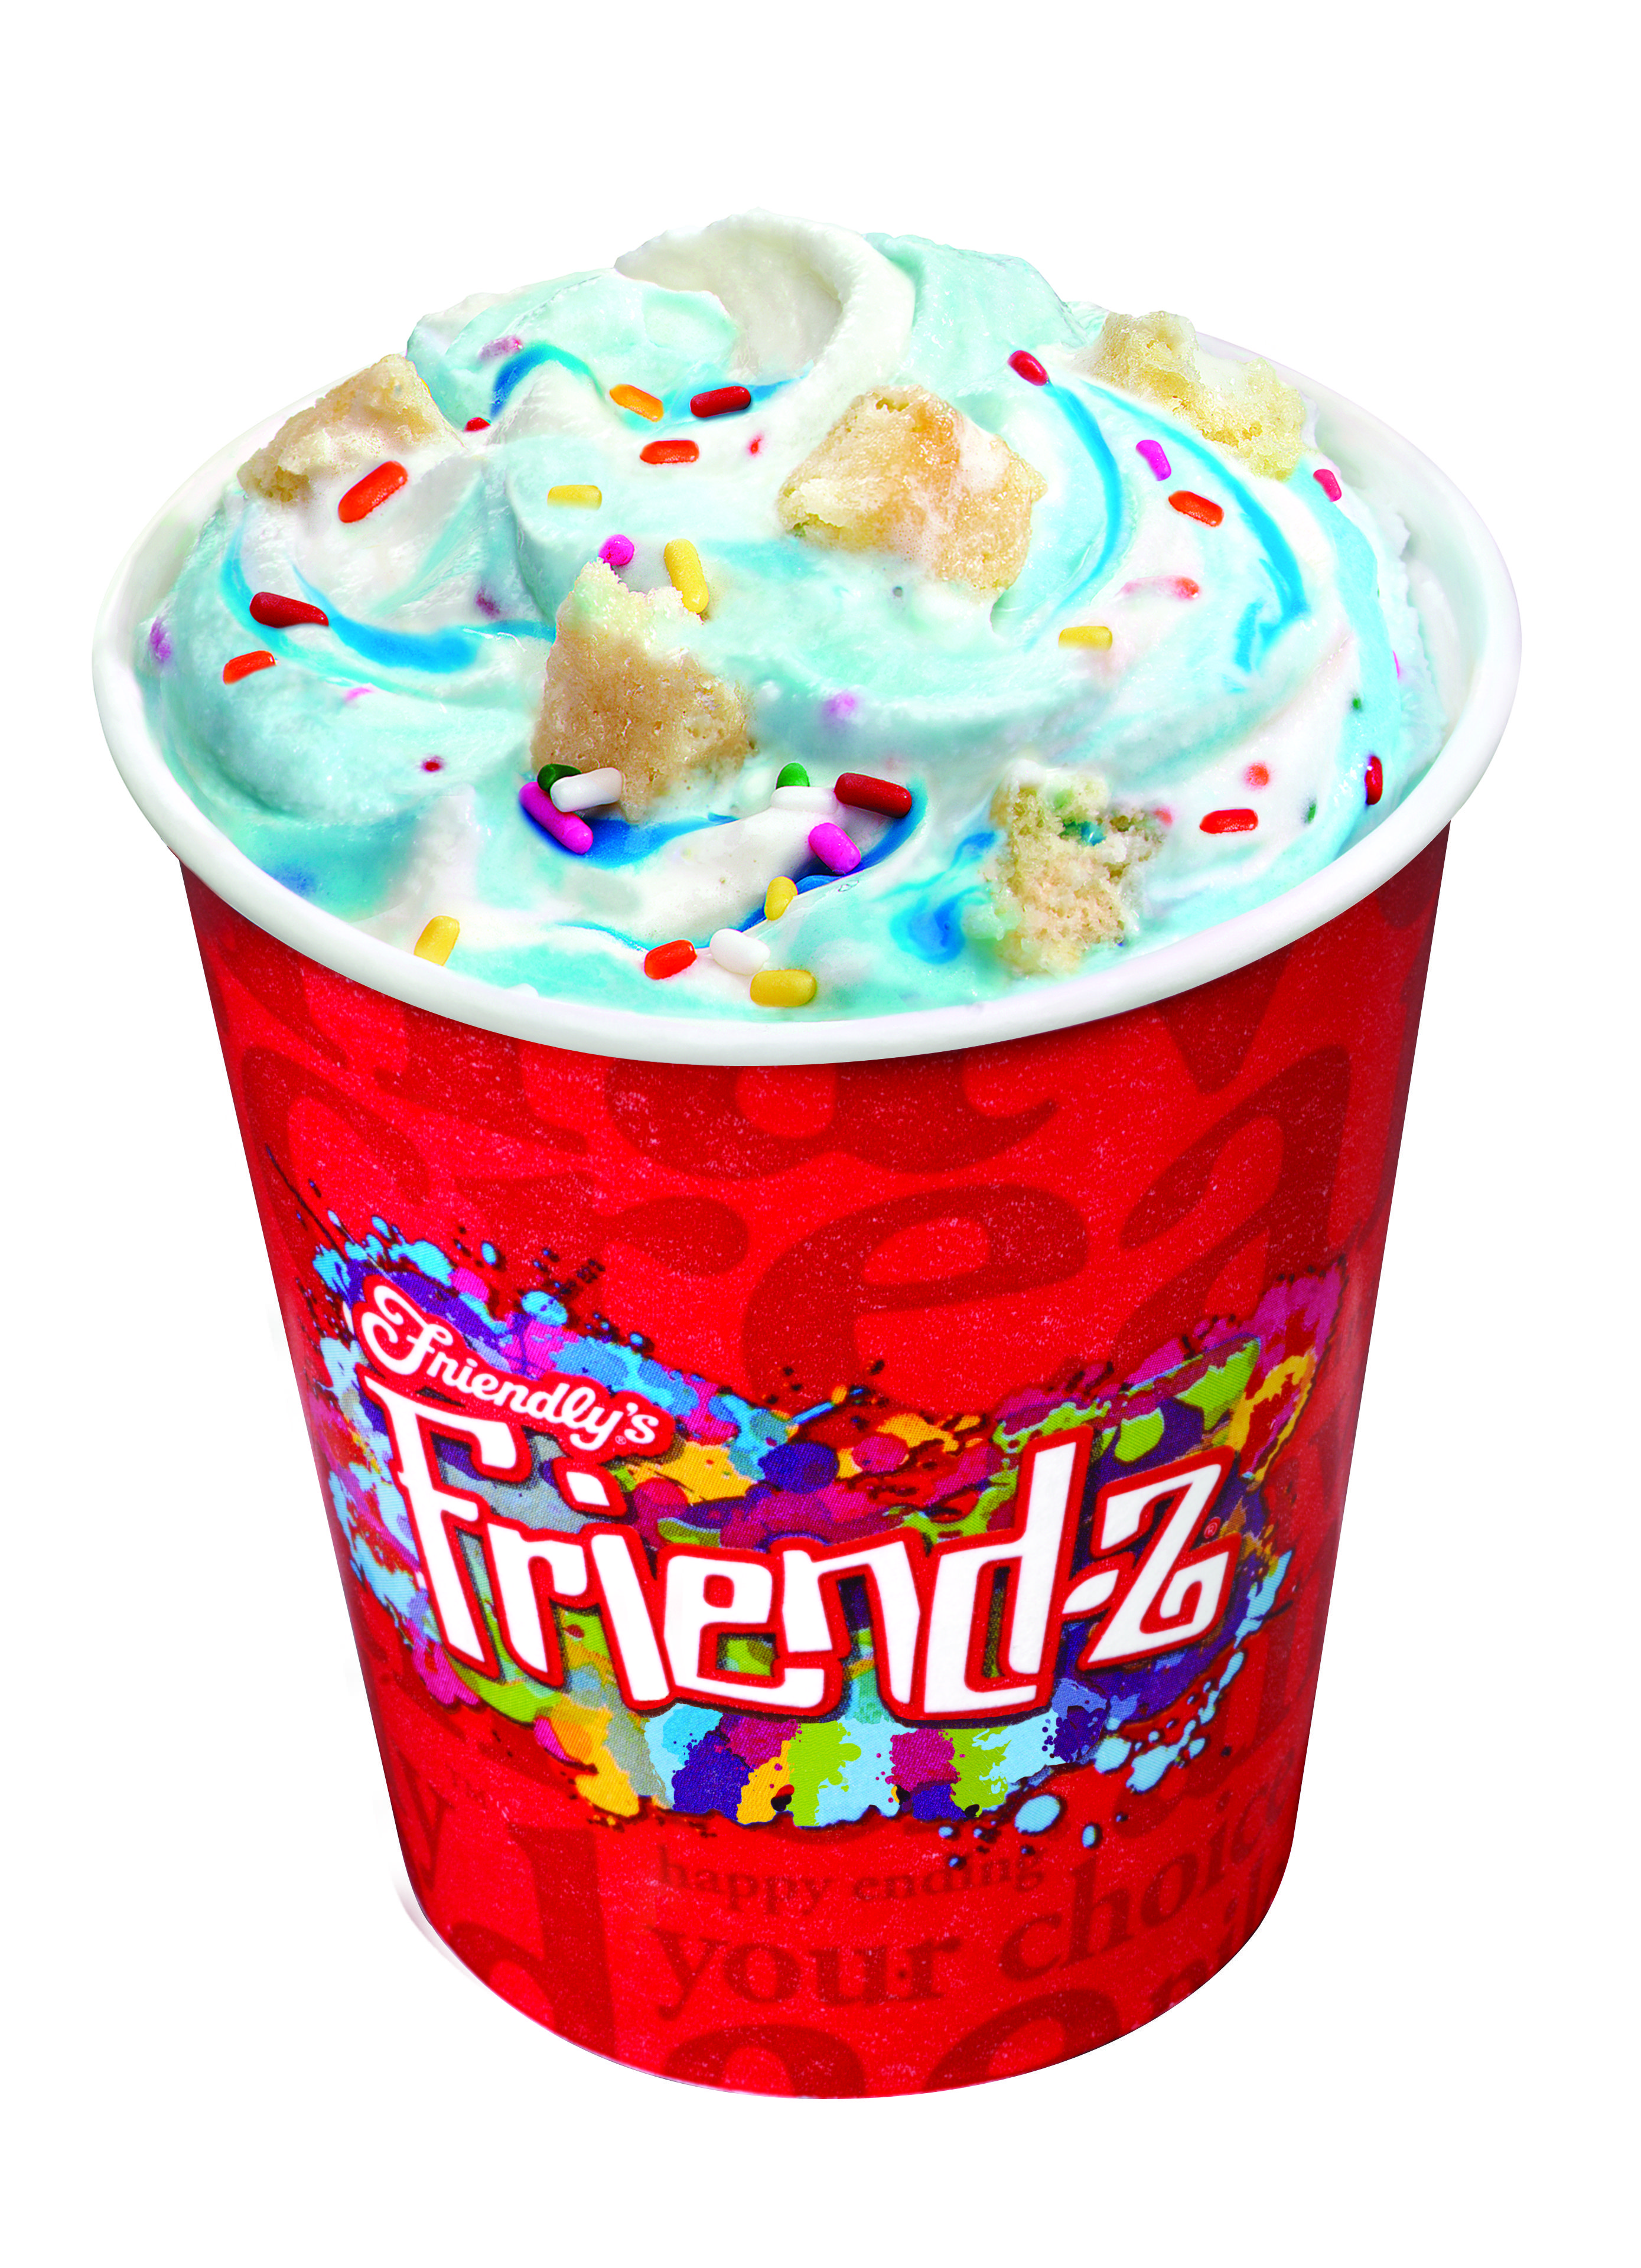 friendly's ice cream cake strawberry krunch